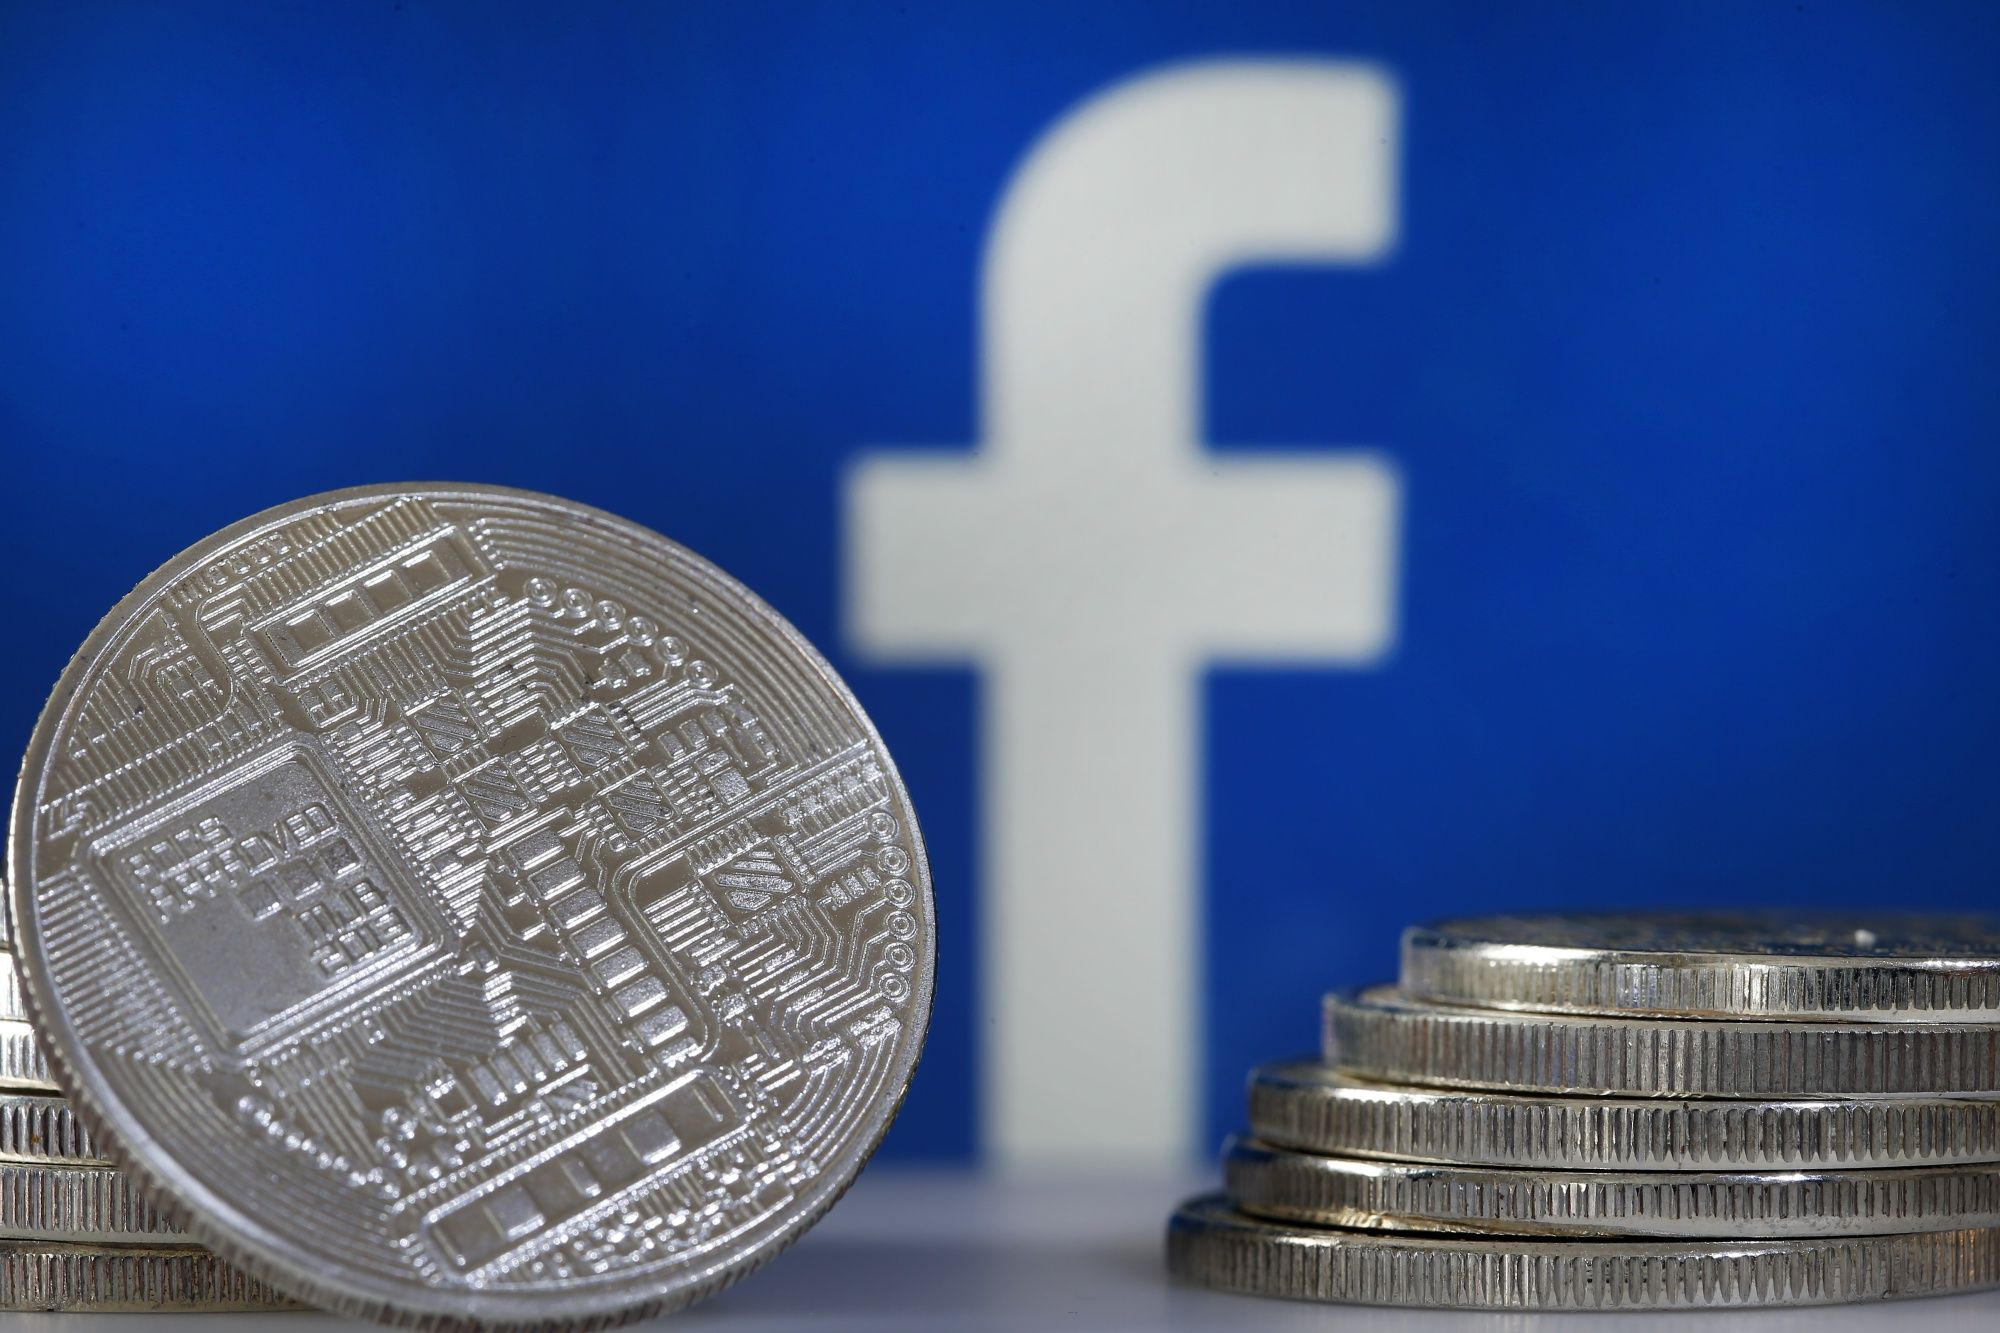 Facebooks Cryptocurrency Plan Draws ECB Warning on Regulation